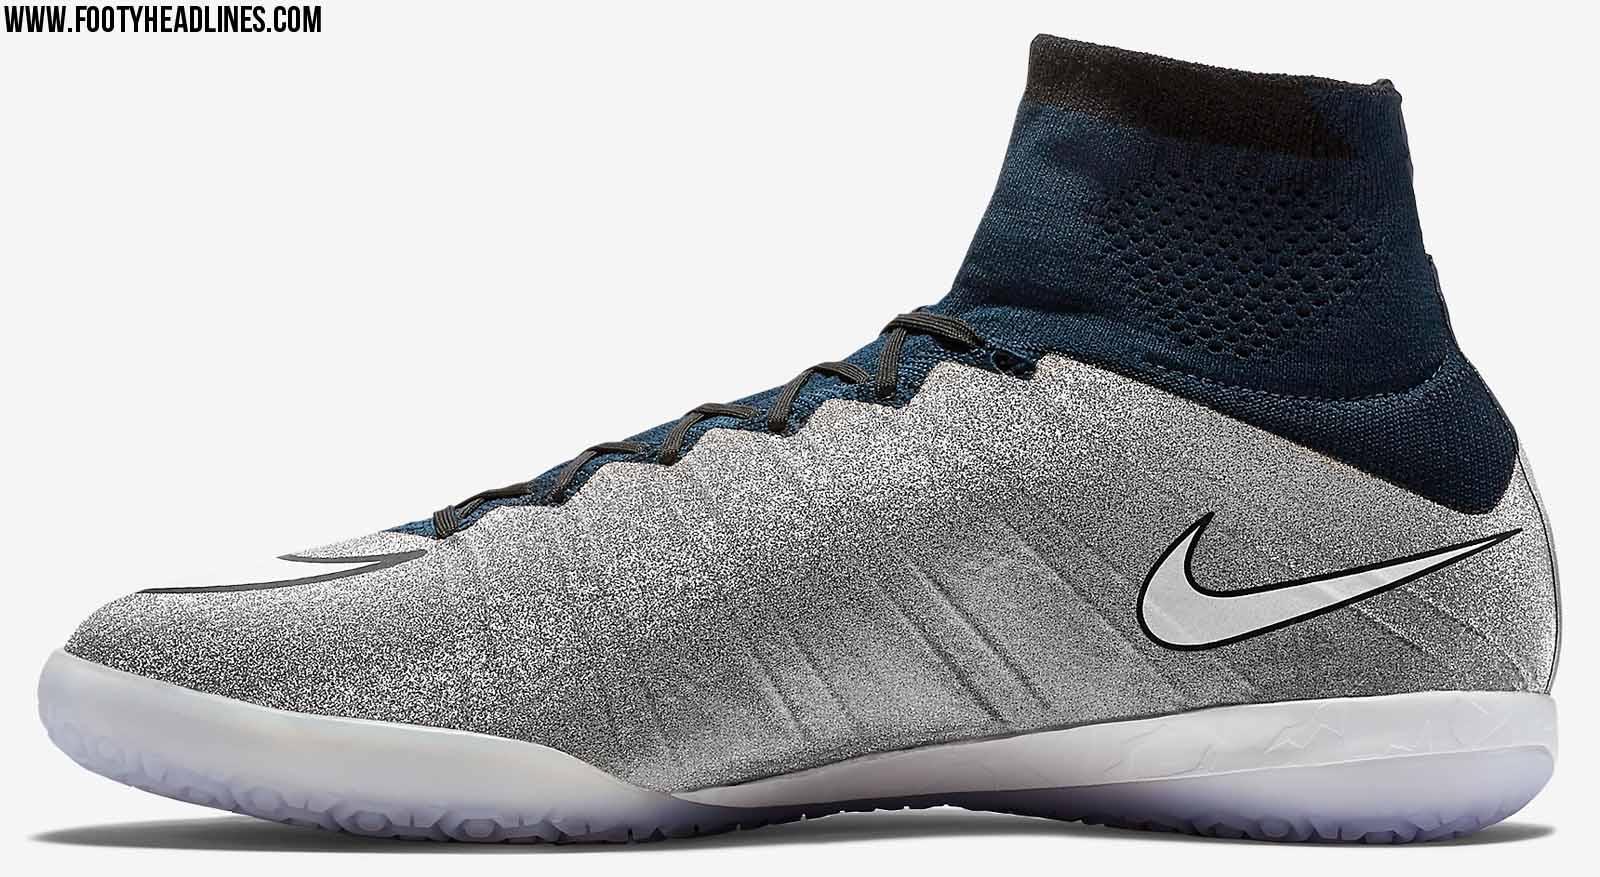 Silberne Nike Mercurial X Proximo SE CR7 Silverware